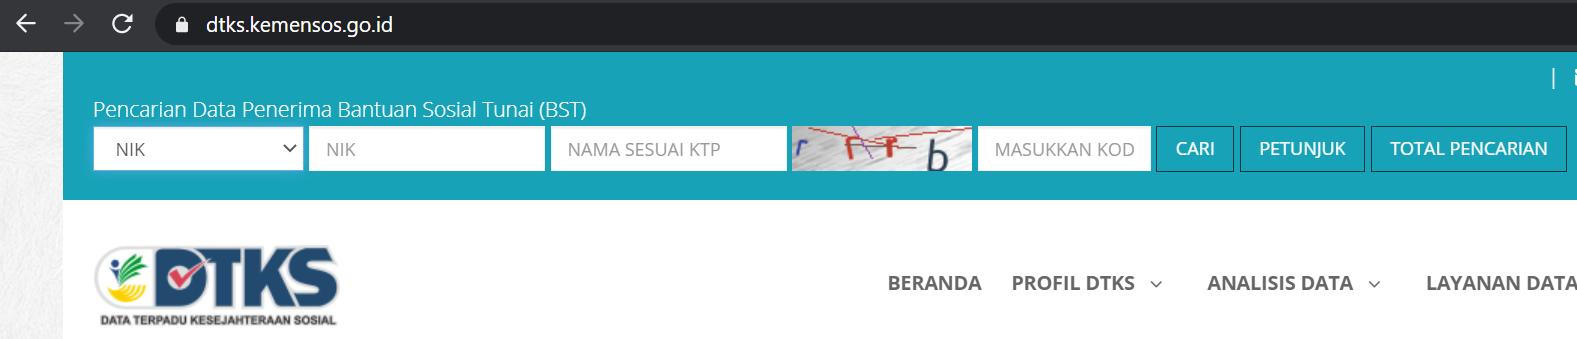 Jangan Lupa Cek NIK KTP di dtks.kemensos.go.id untuk Dapatkan Bantuan BST Rp300 Ribu yang Cair Desember Ini